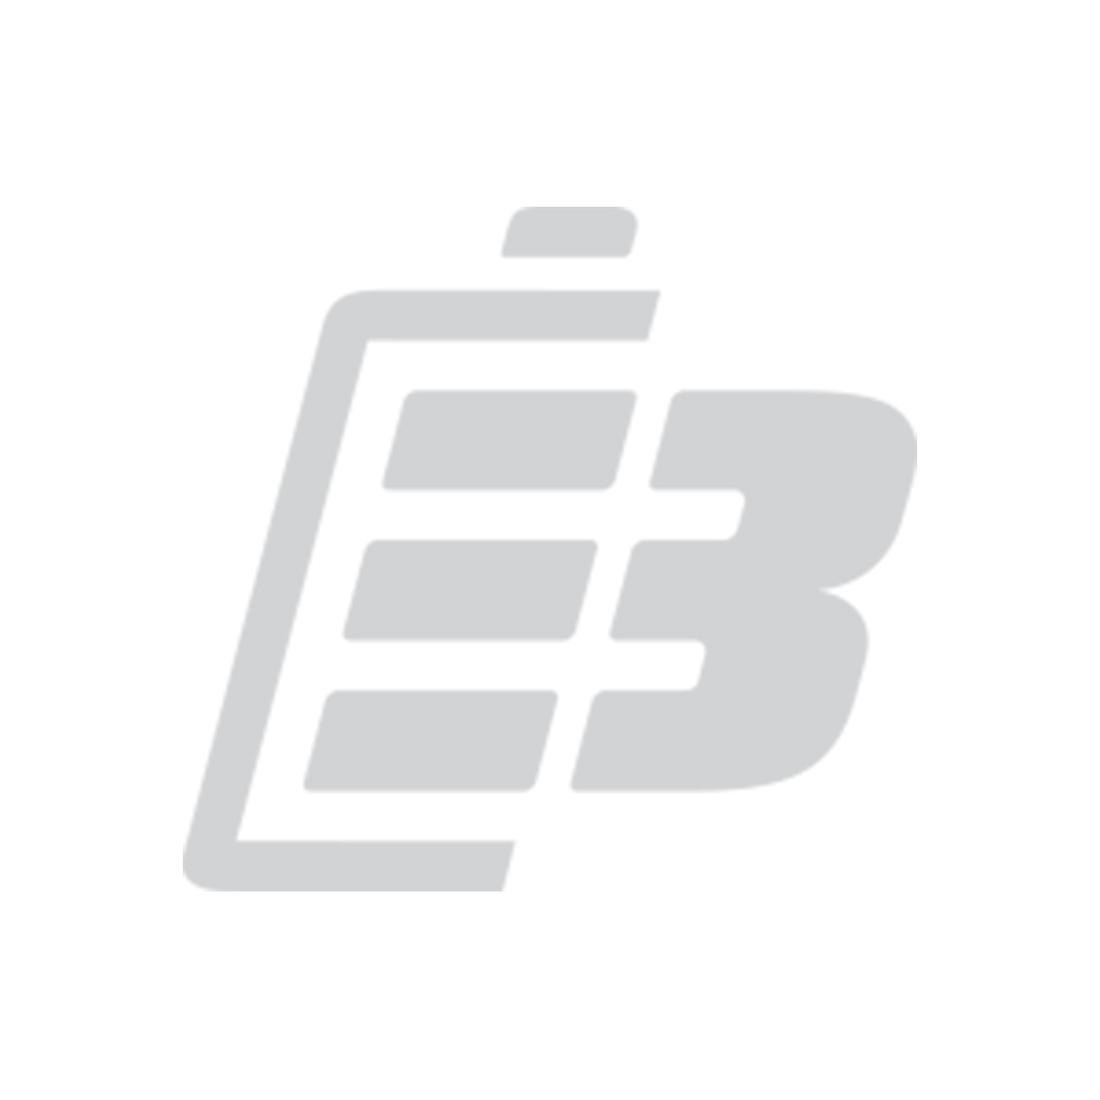 Power tool battery Makita 14.4V 3.0Ah_1